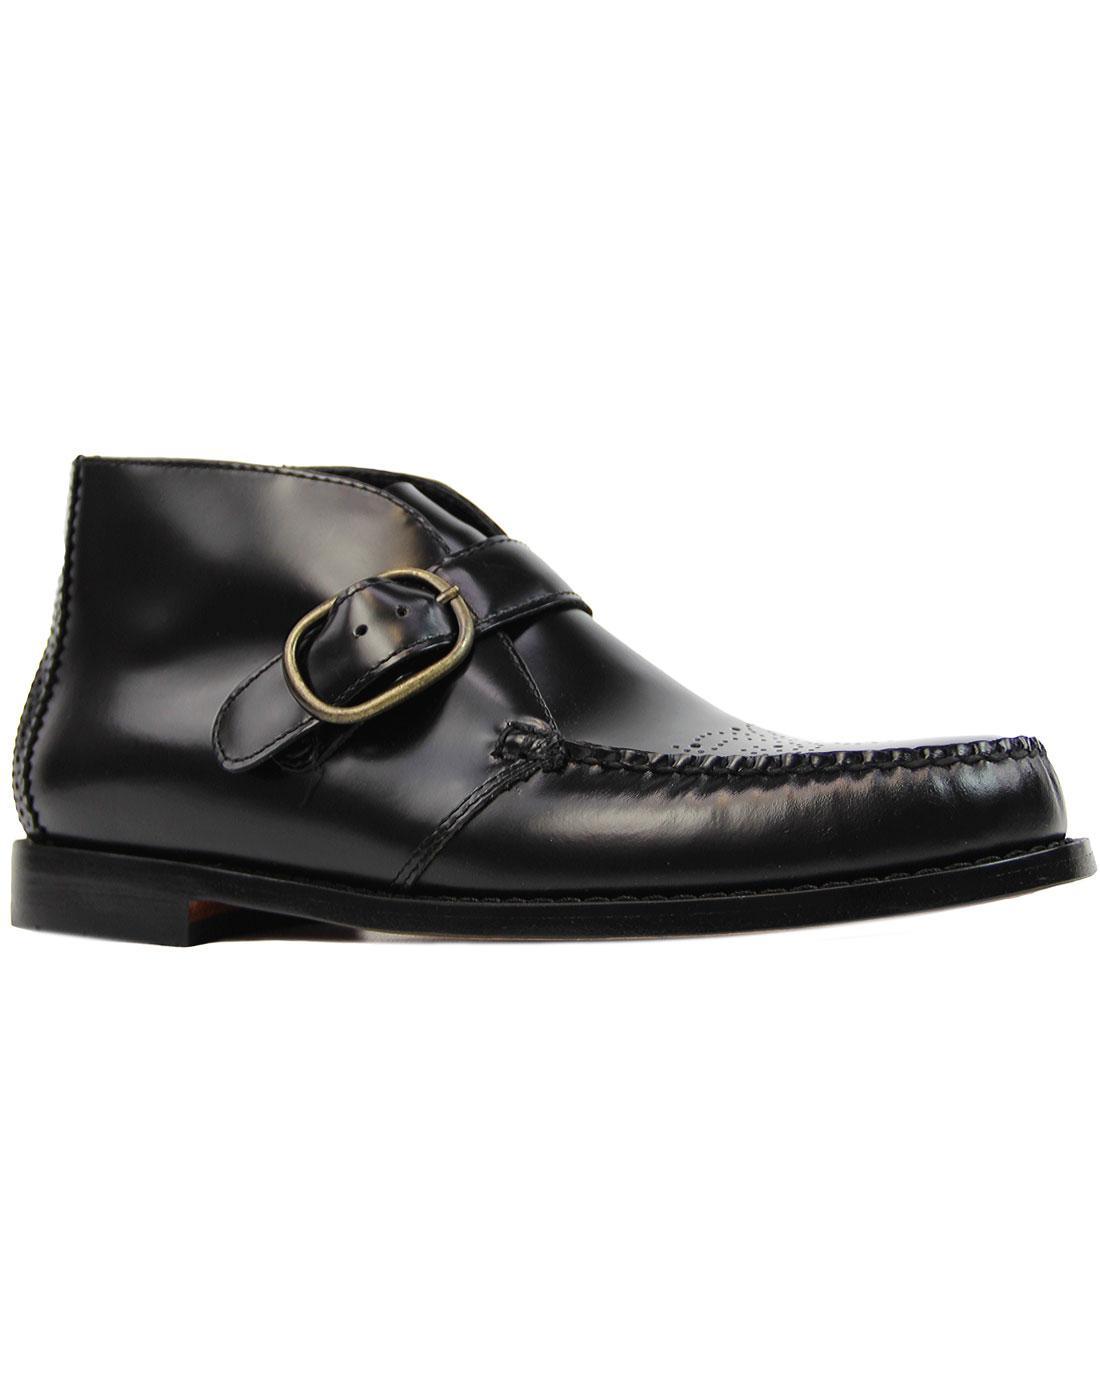 Langley Mid BASS WEEJEUNS Mod Chukka Loafer Boots